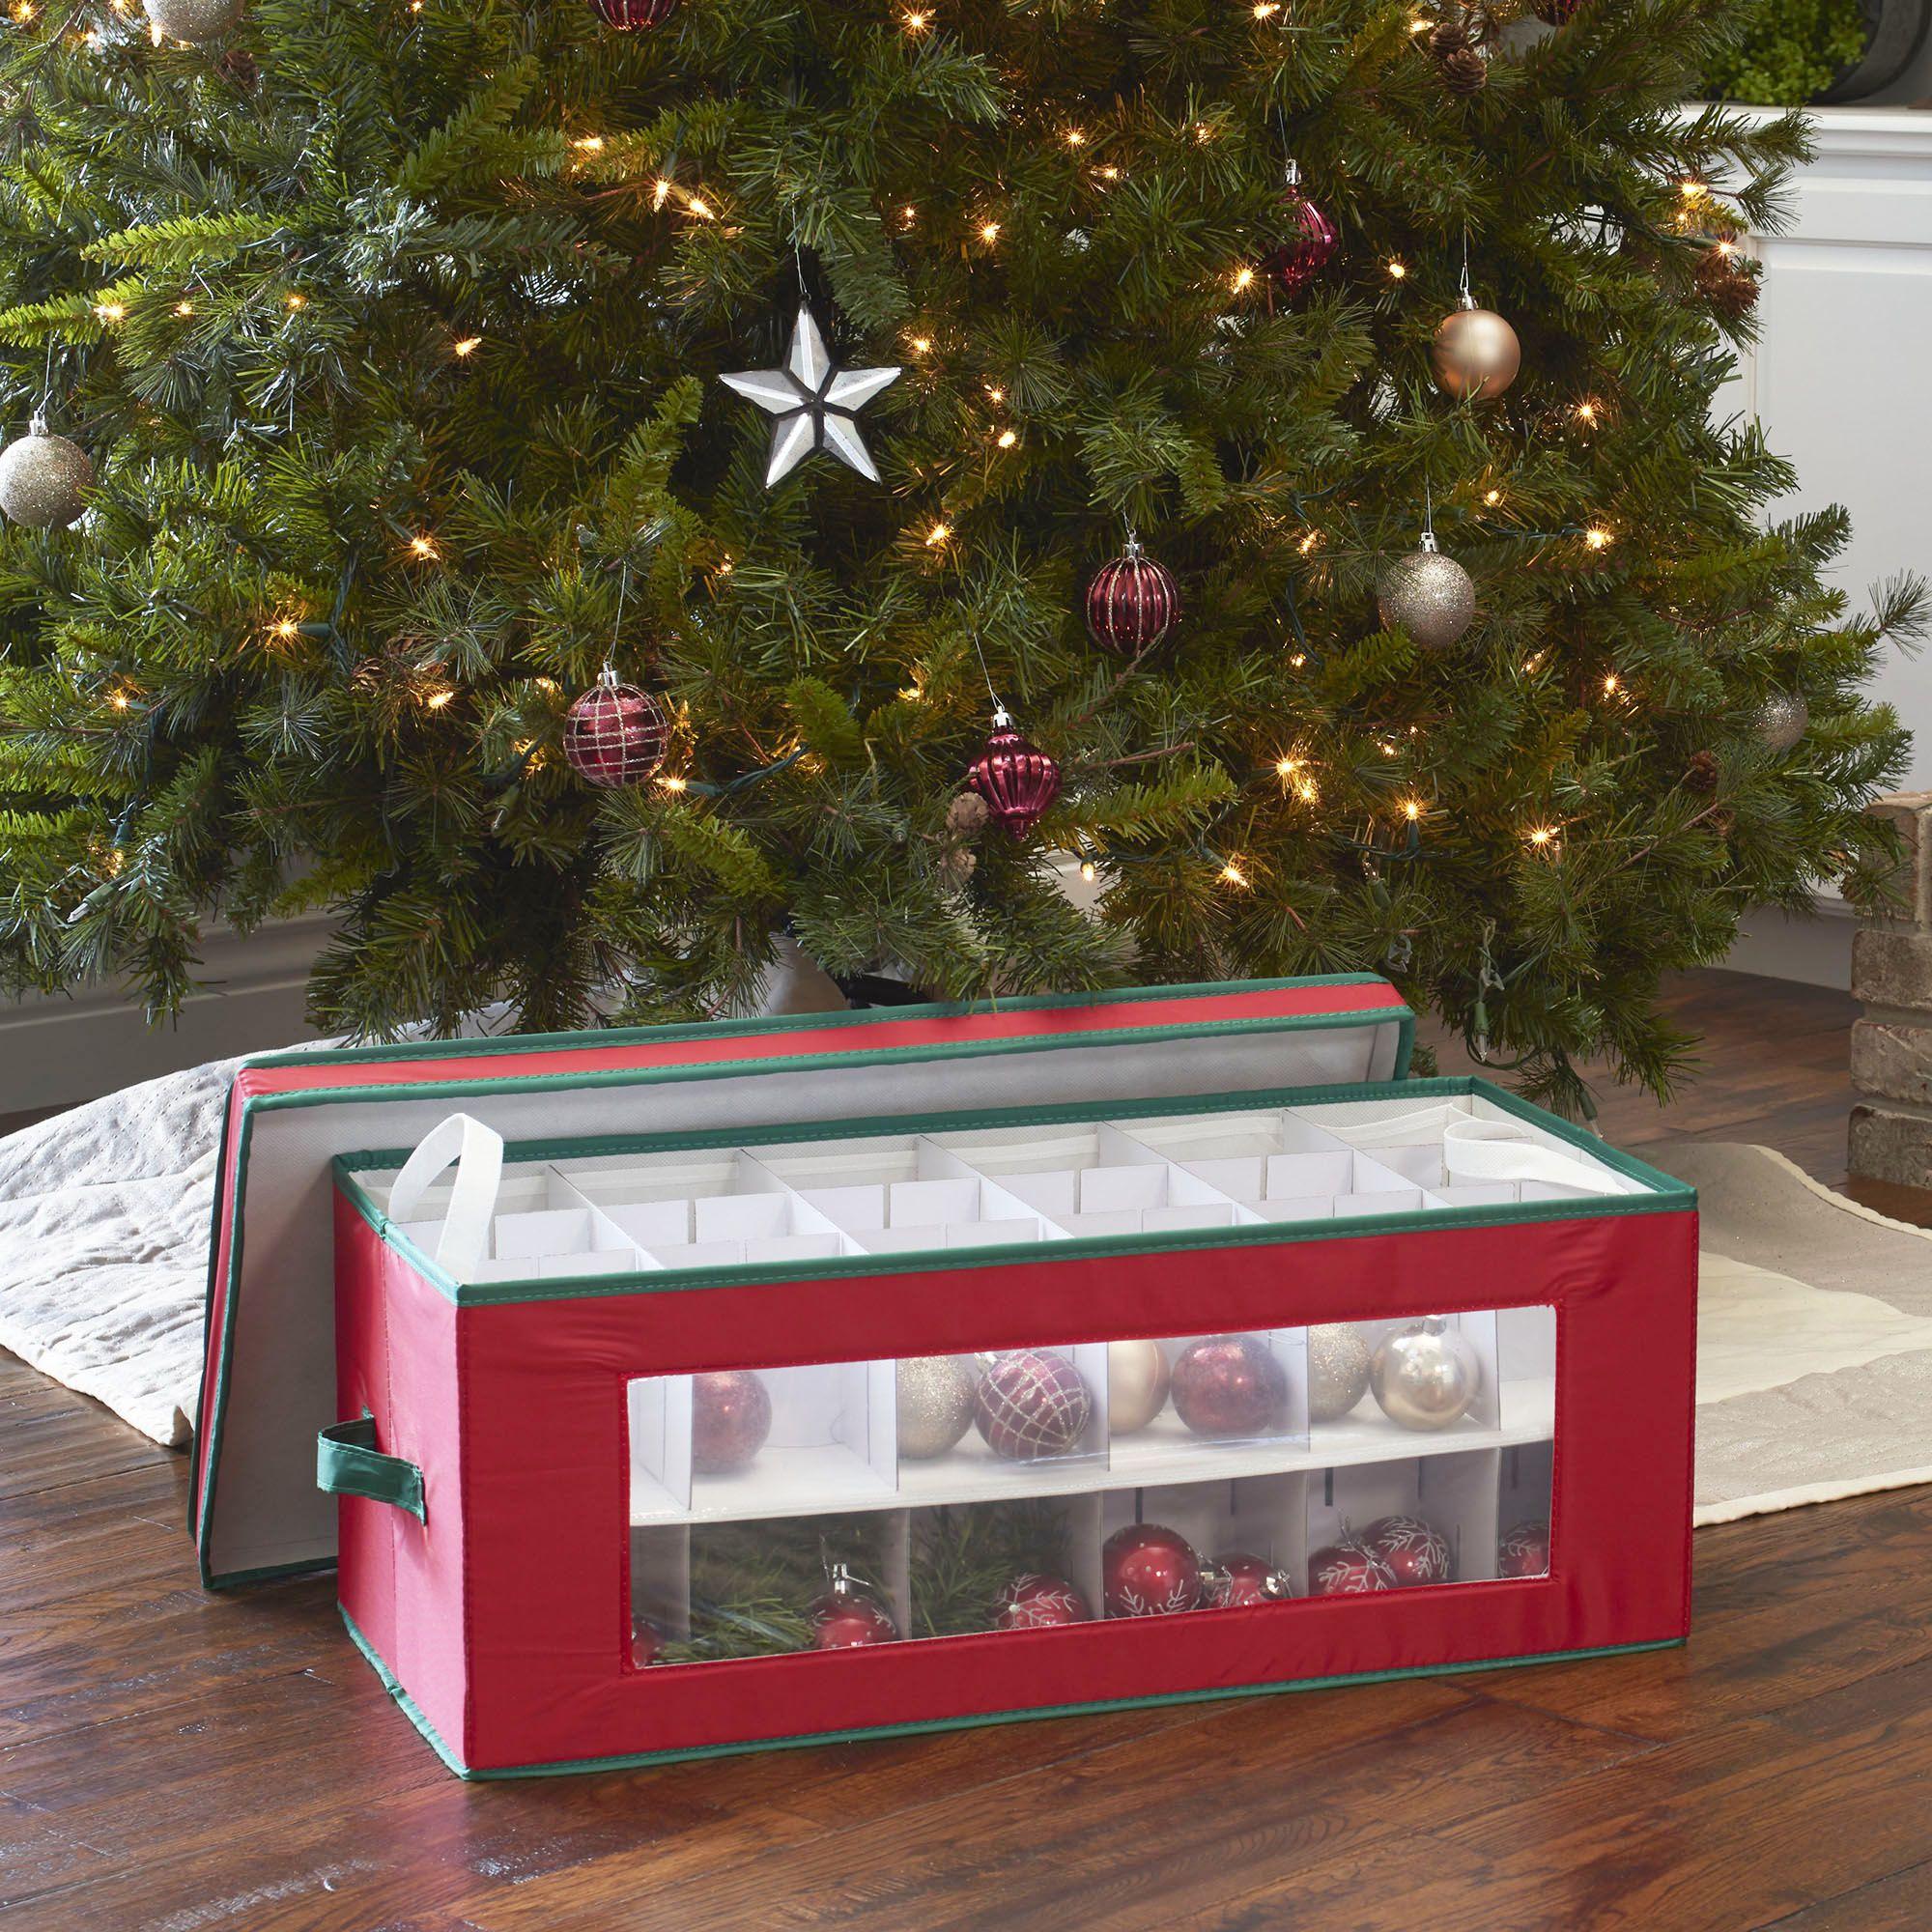 Window Vision 36 Pc Holiday Ornament Storage Box In 2020 Ornament Storage Ornament Storage Box Holiday Storage